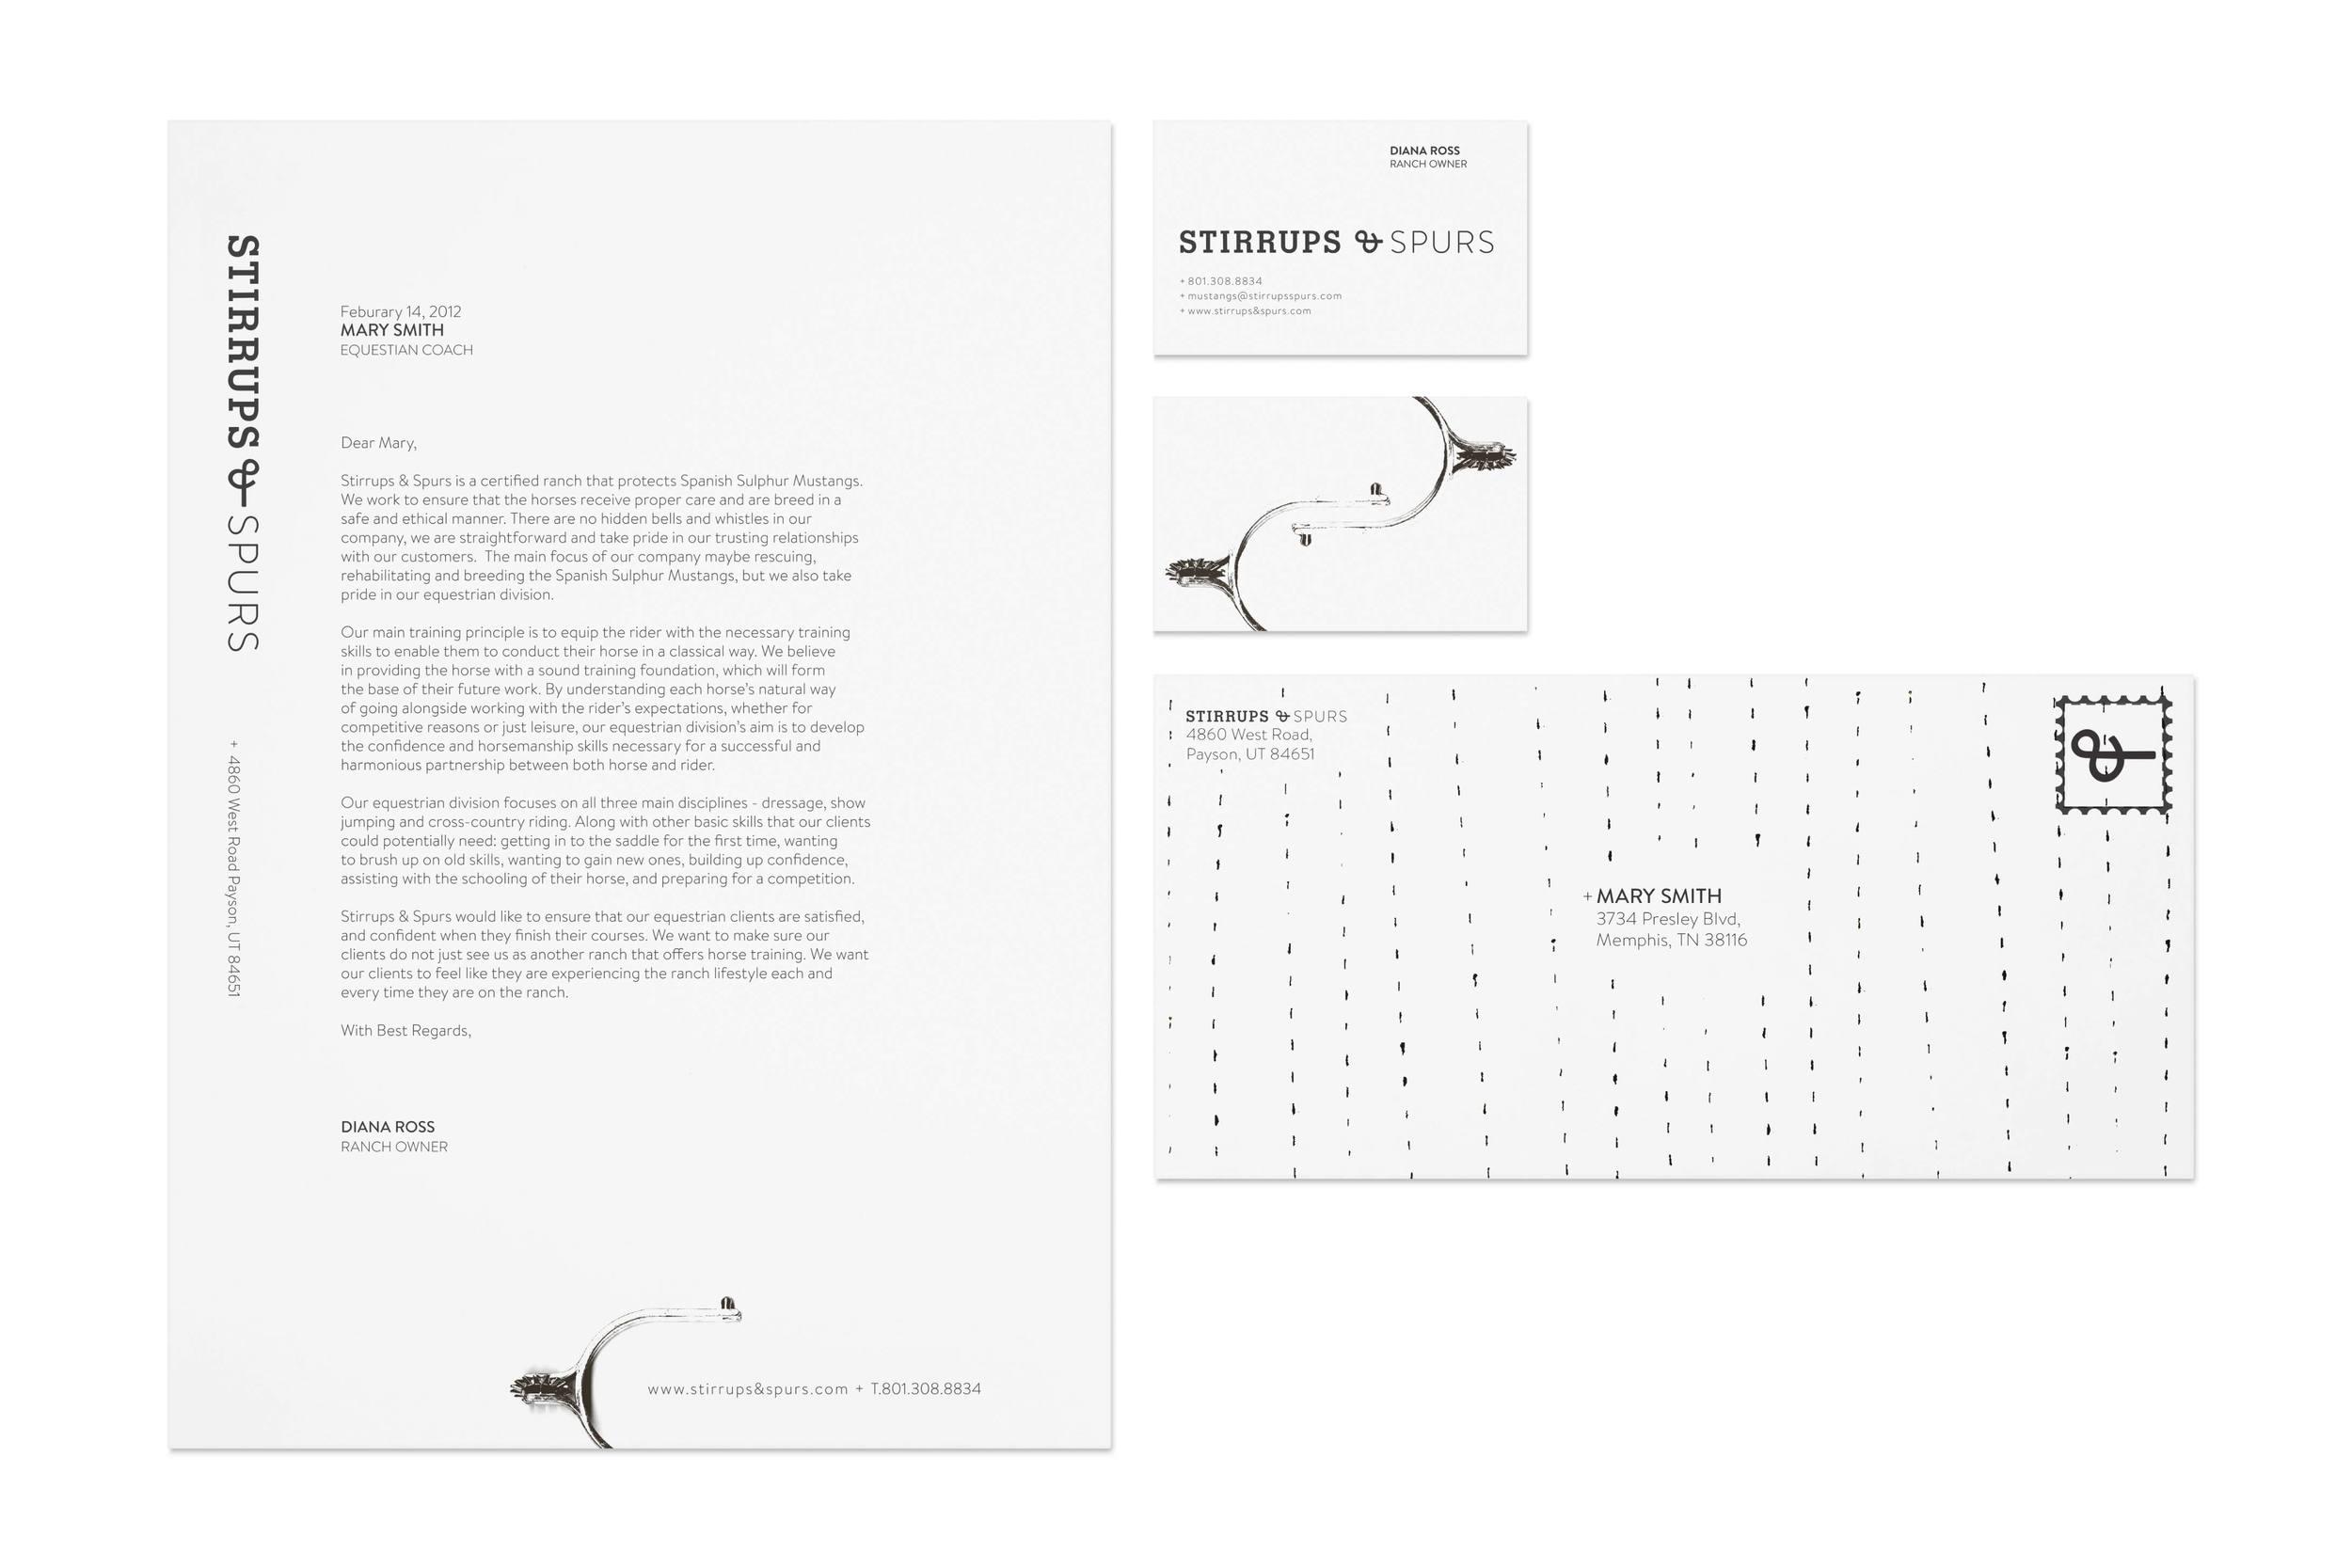 SPURS_Stationery-0468-2013-11-25_1.jpg